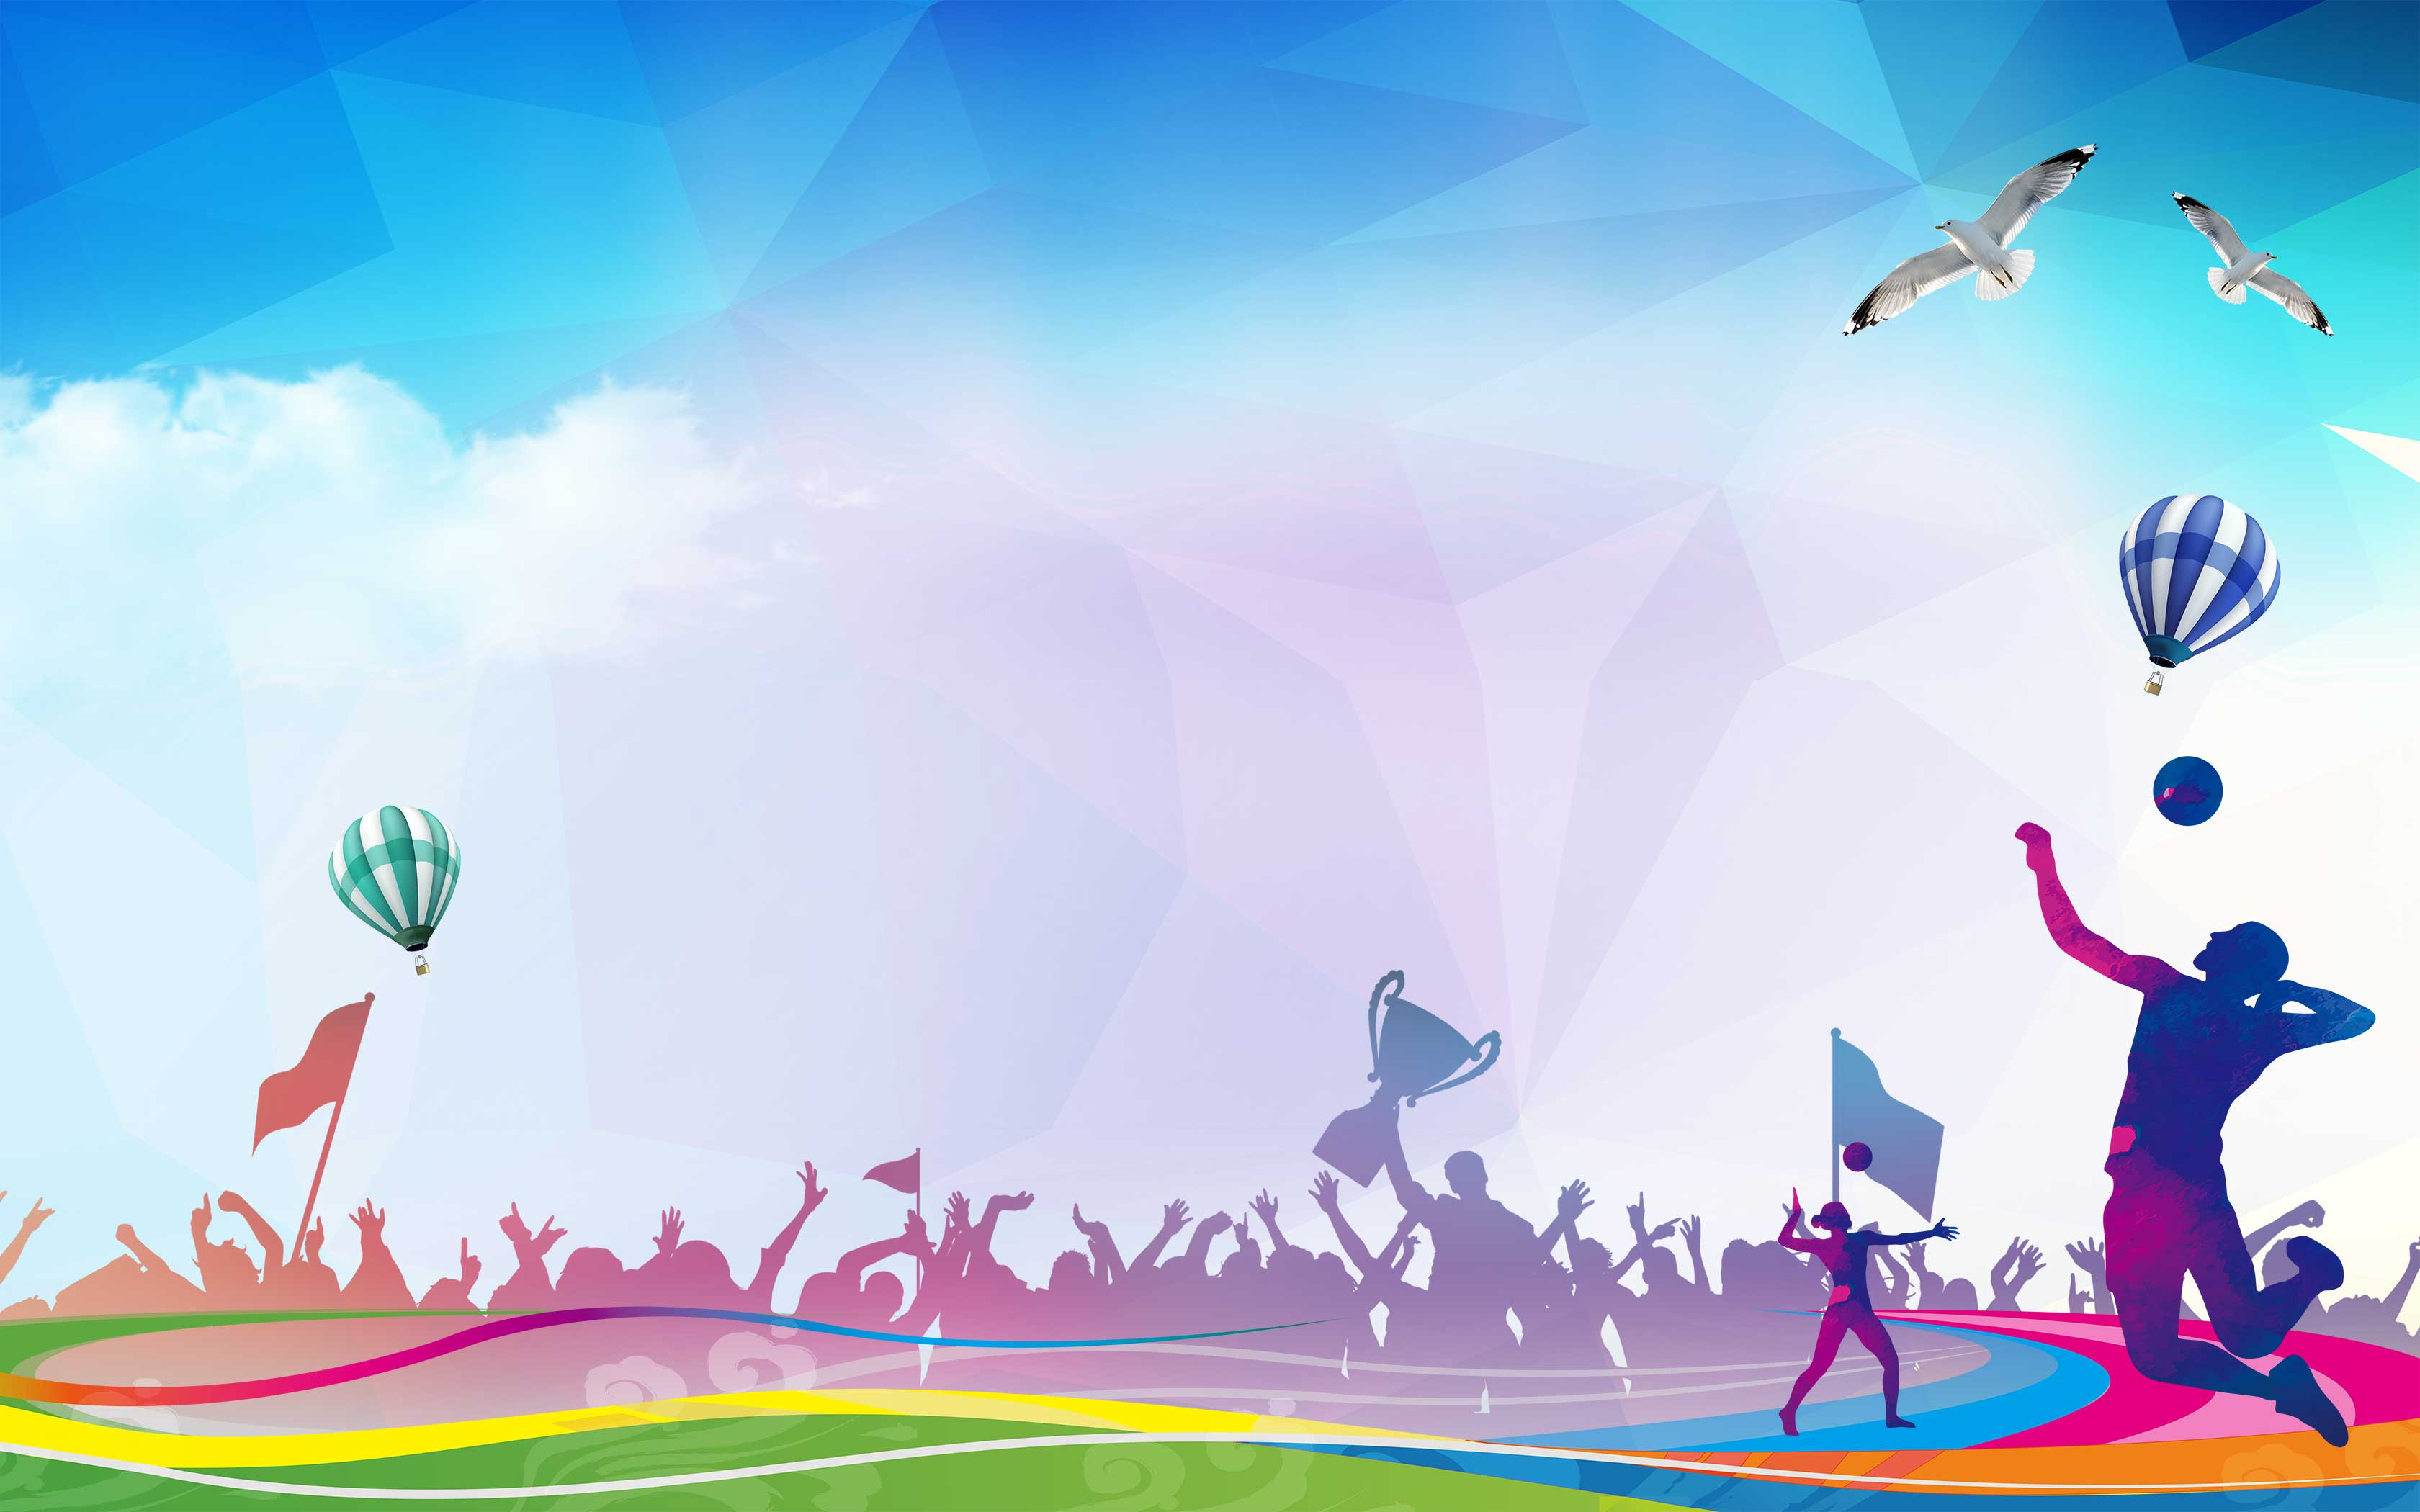 Imágenes Deportes Fondos: A Badminton Match; A Sports Meet, Badminton, Match, Sports